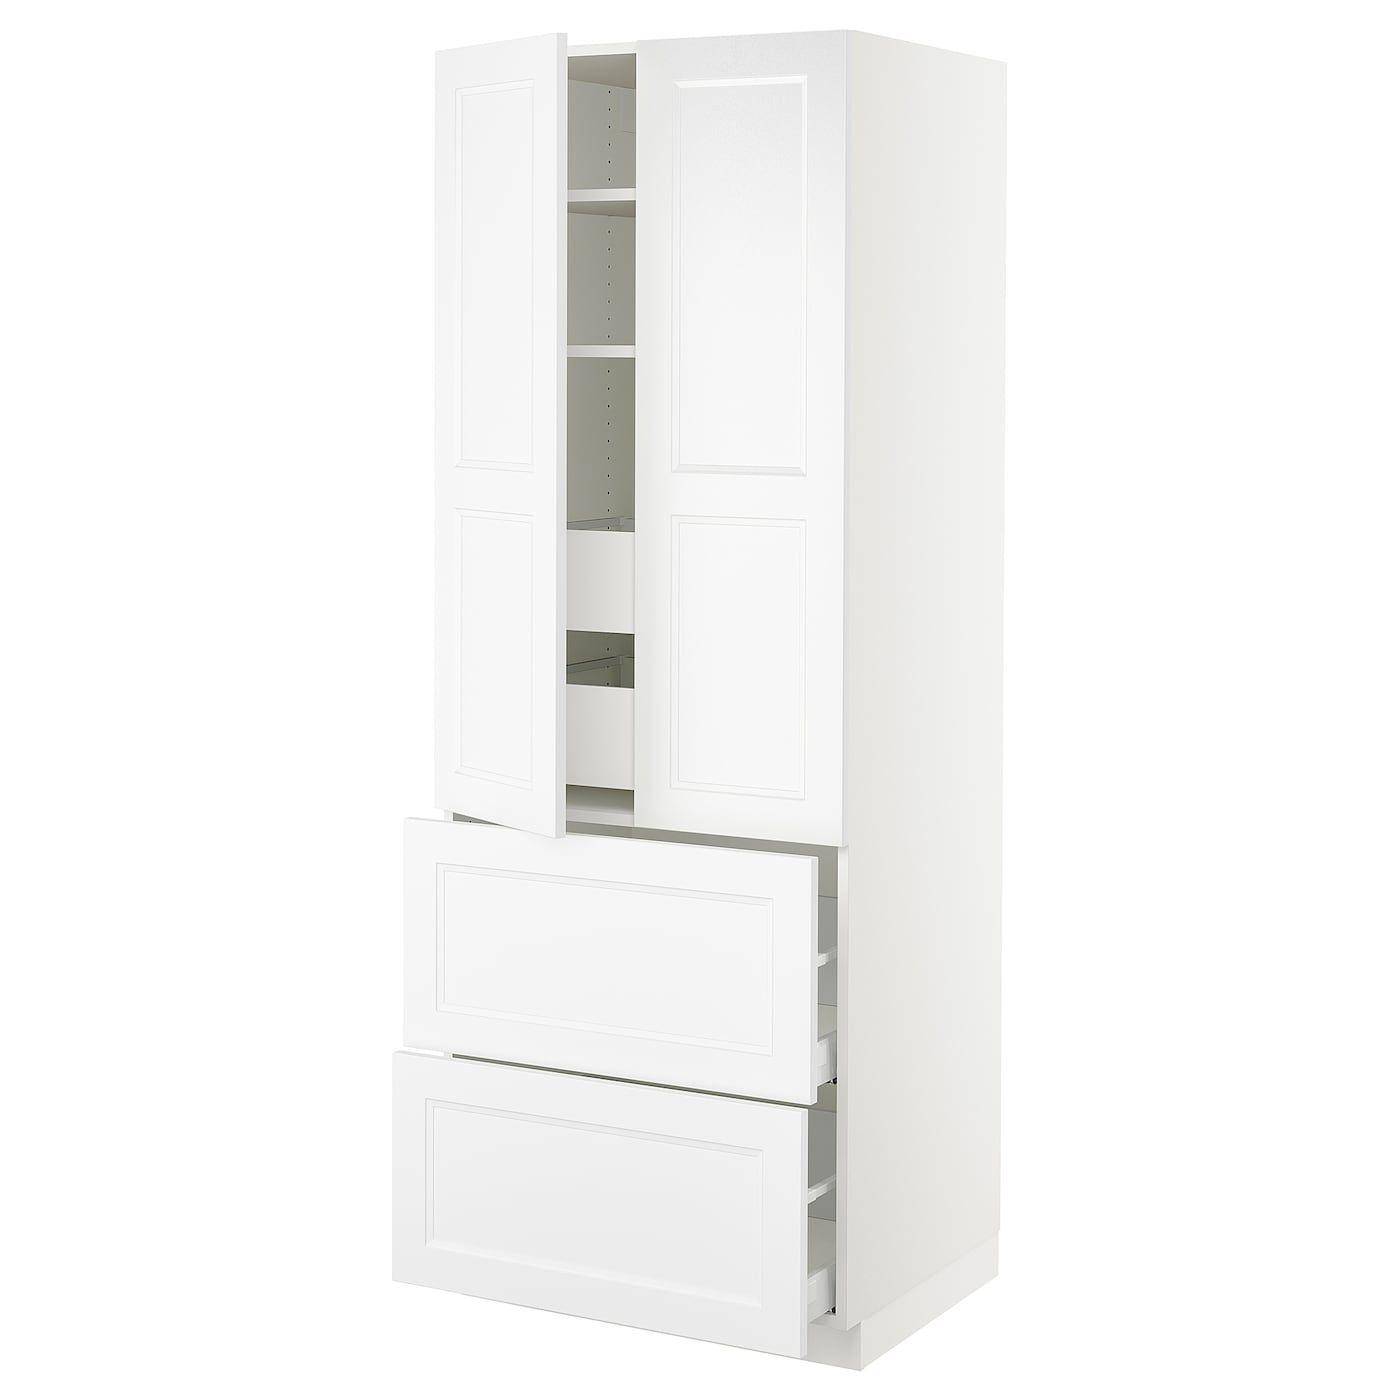 Ikea Sektion White High Cabinet W 2doors 4 Drawers Frame